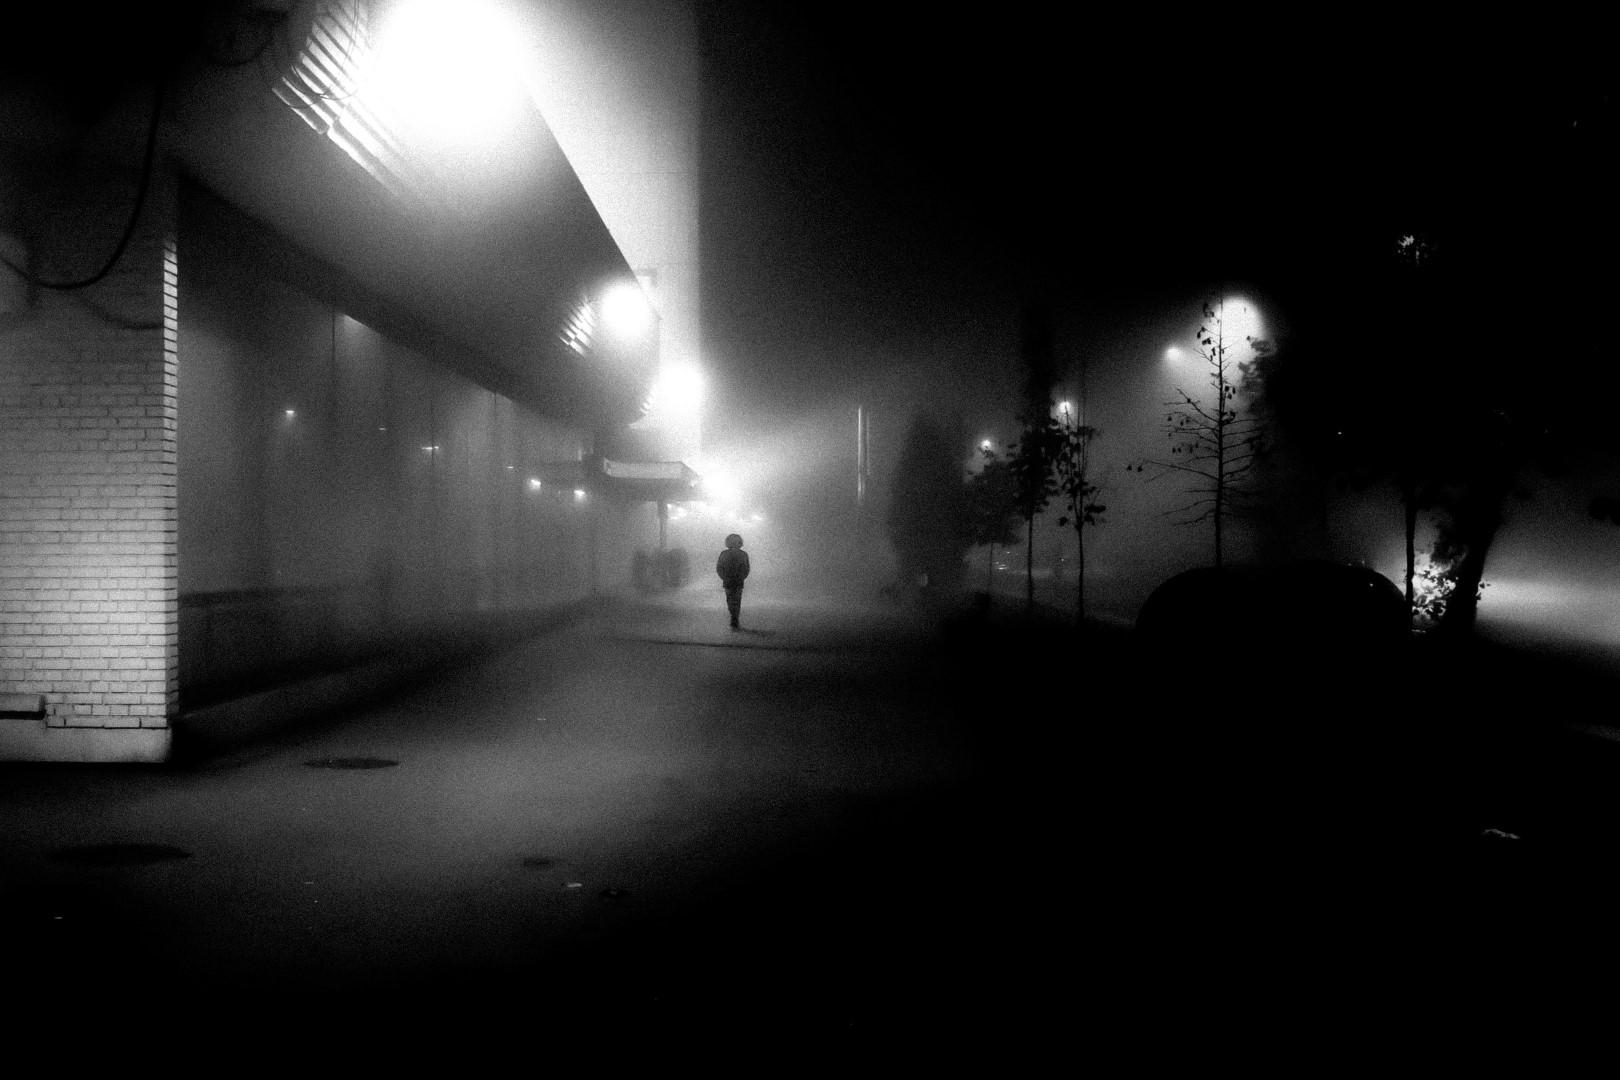 lonely_22928759750_o (Large).jpg